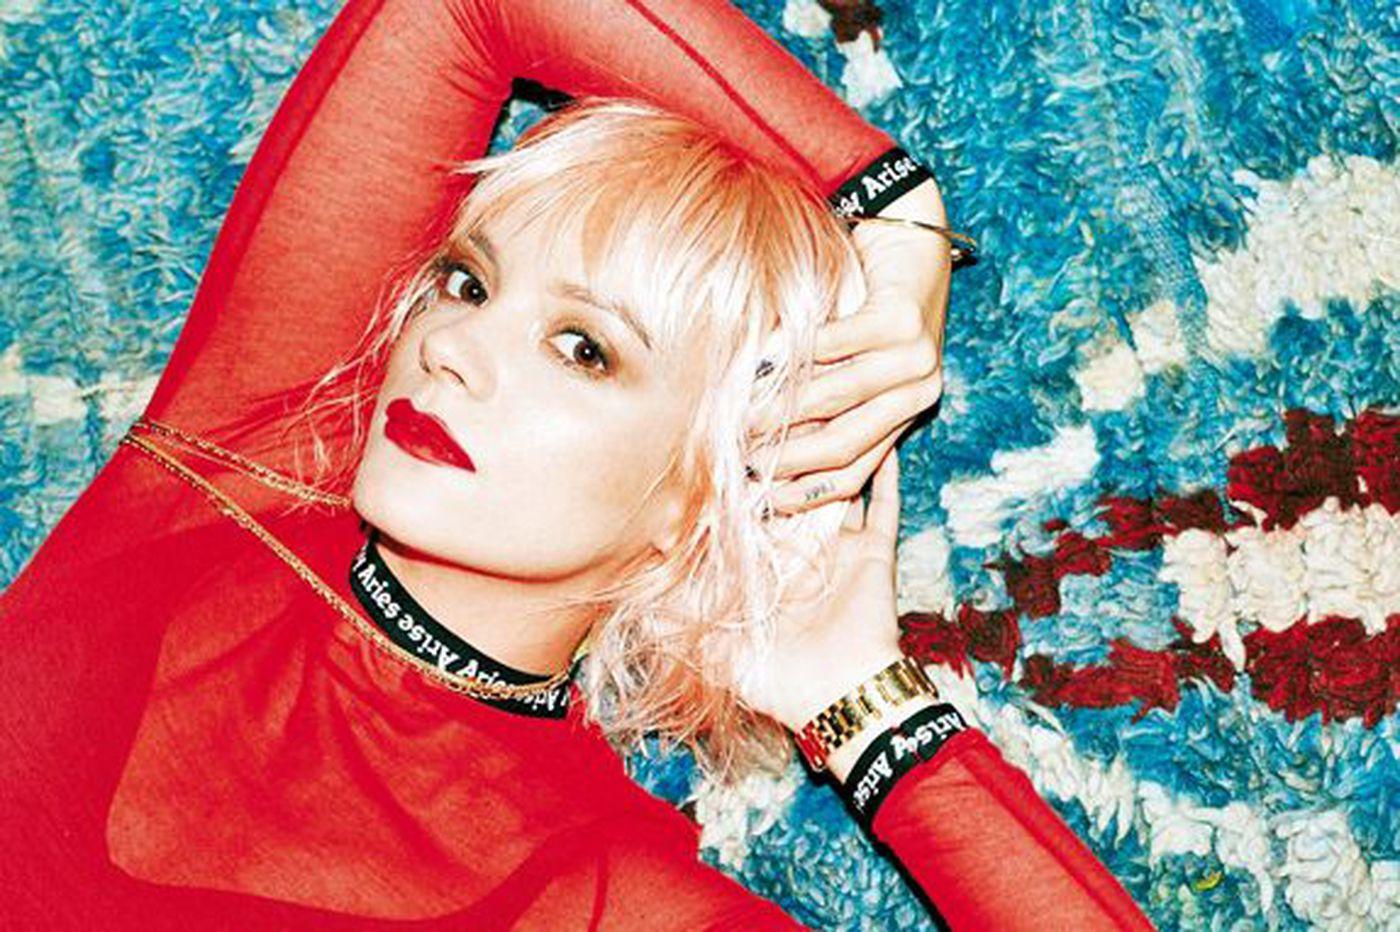 Album reviews: Nine Inch Nails, Lily Allen, Angelique Kidjo